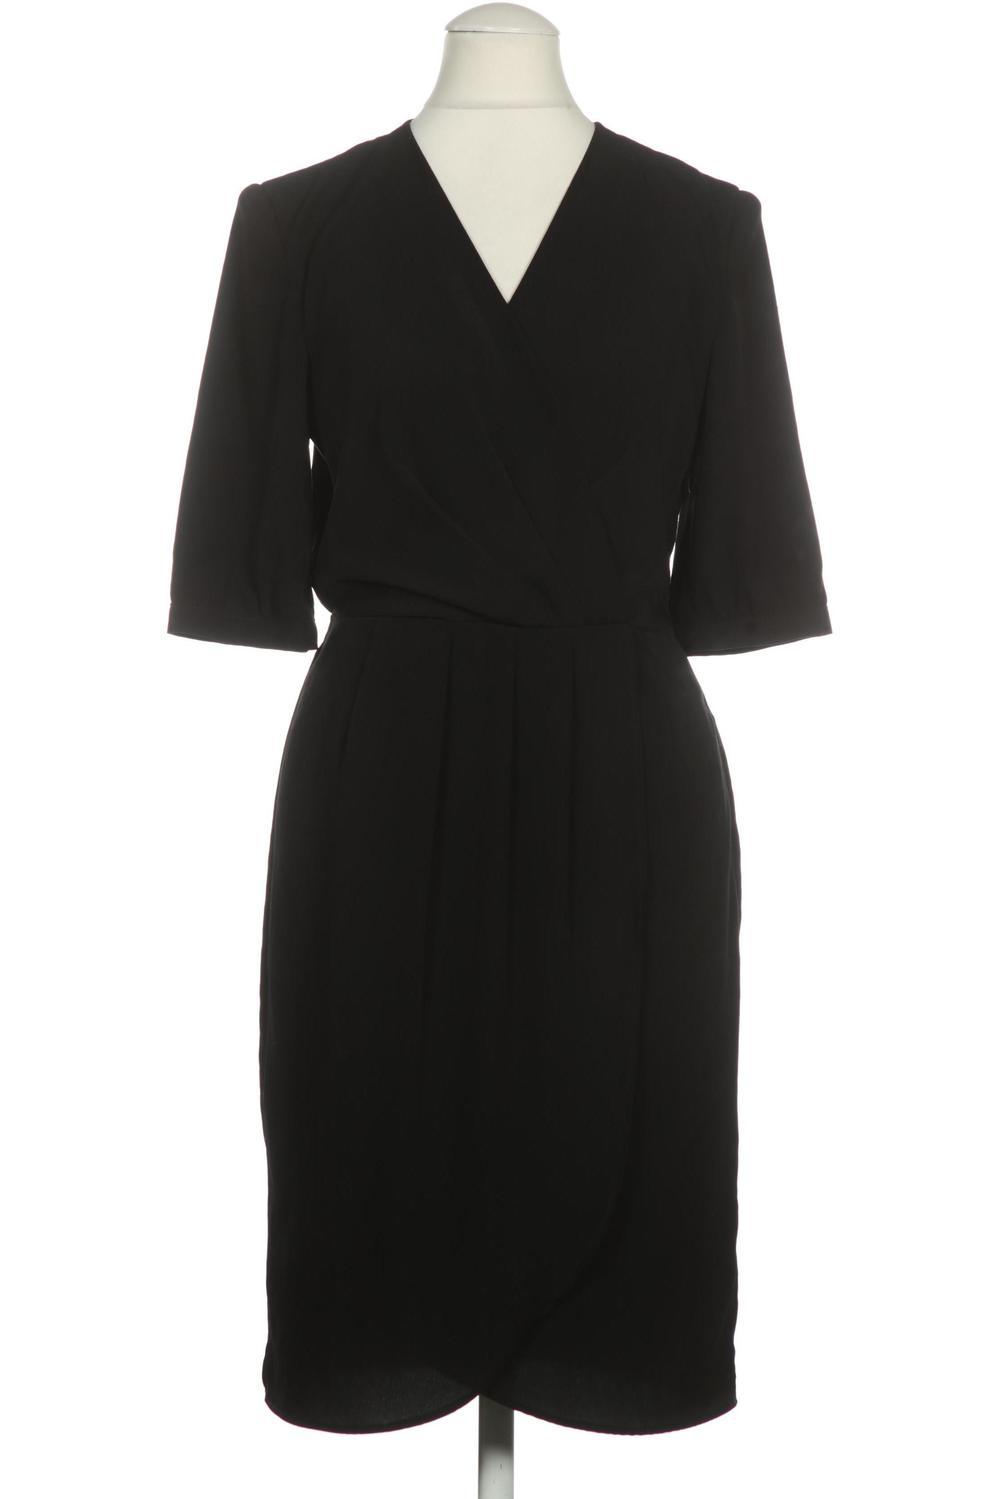 LIU.JO Damen Kleid DE 40 Second Hand kaufen   ubup